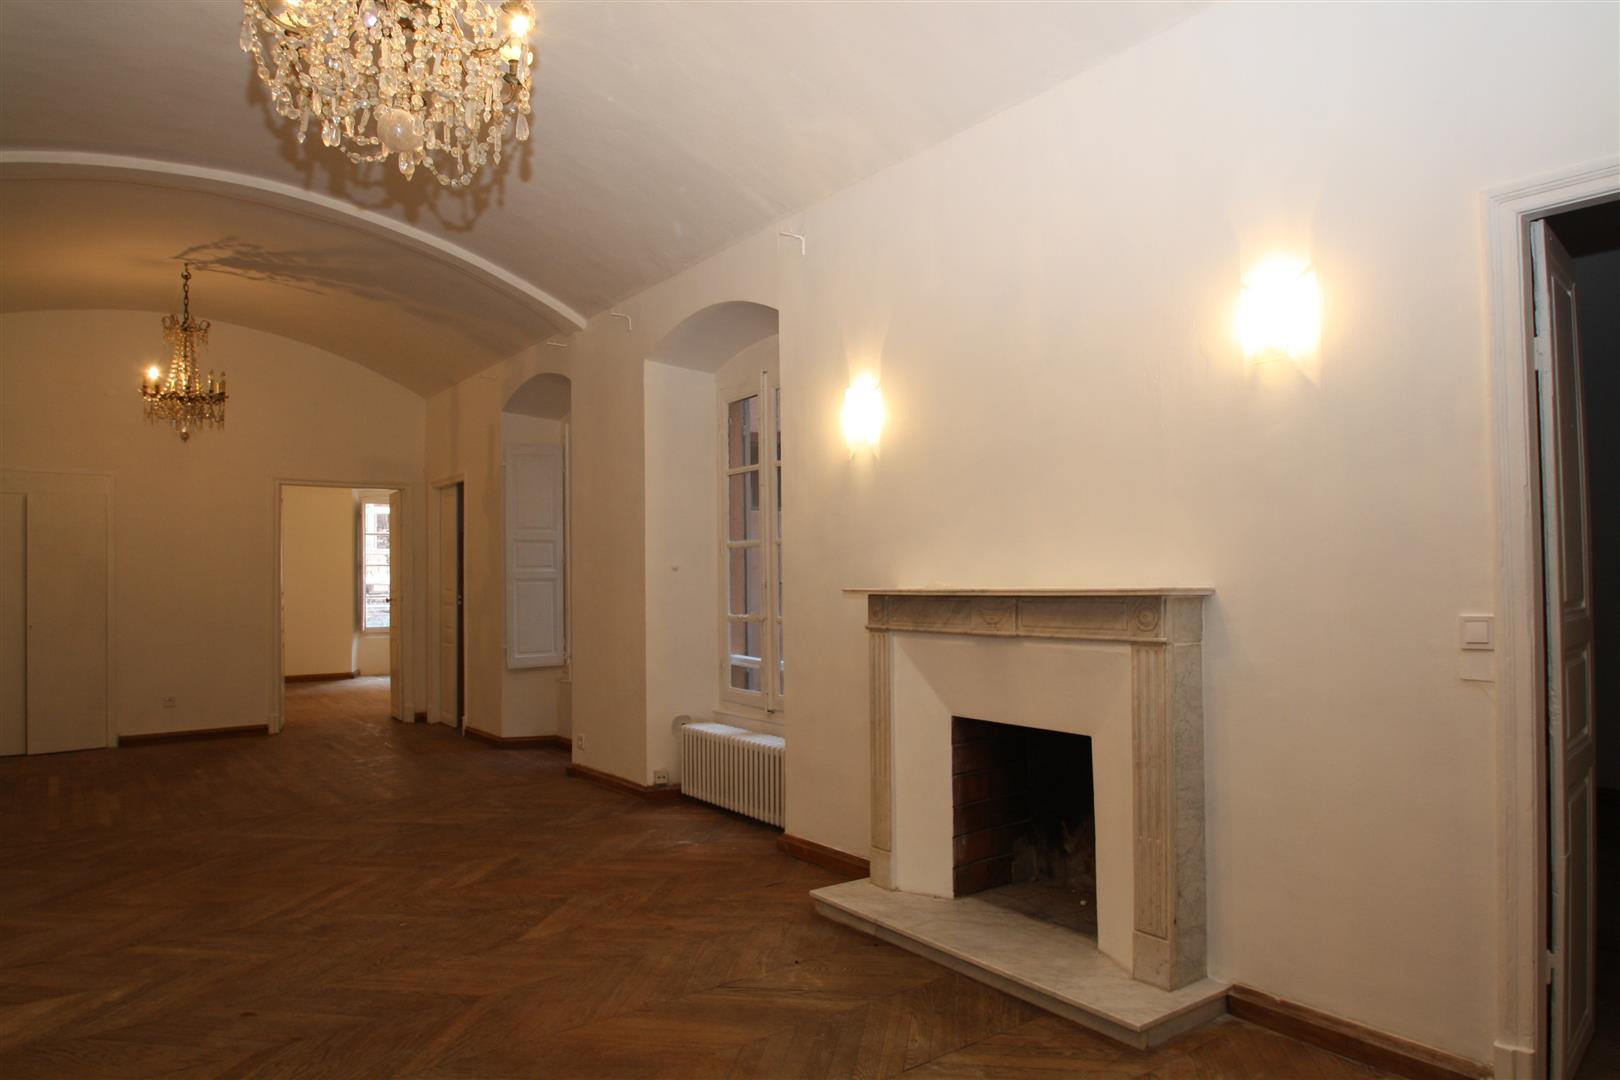 bastia appartement centre agence immobili re bastia avec localisimmo agence immobili re. Black Bedroom Furniture Sets. Home Design Ideas